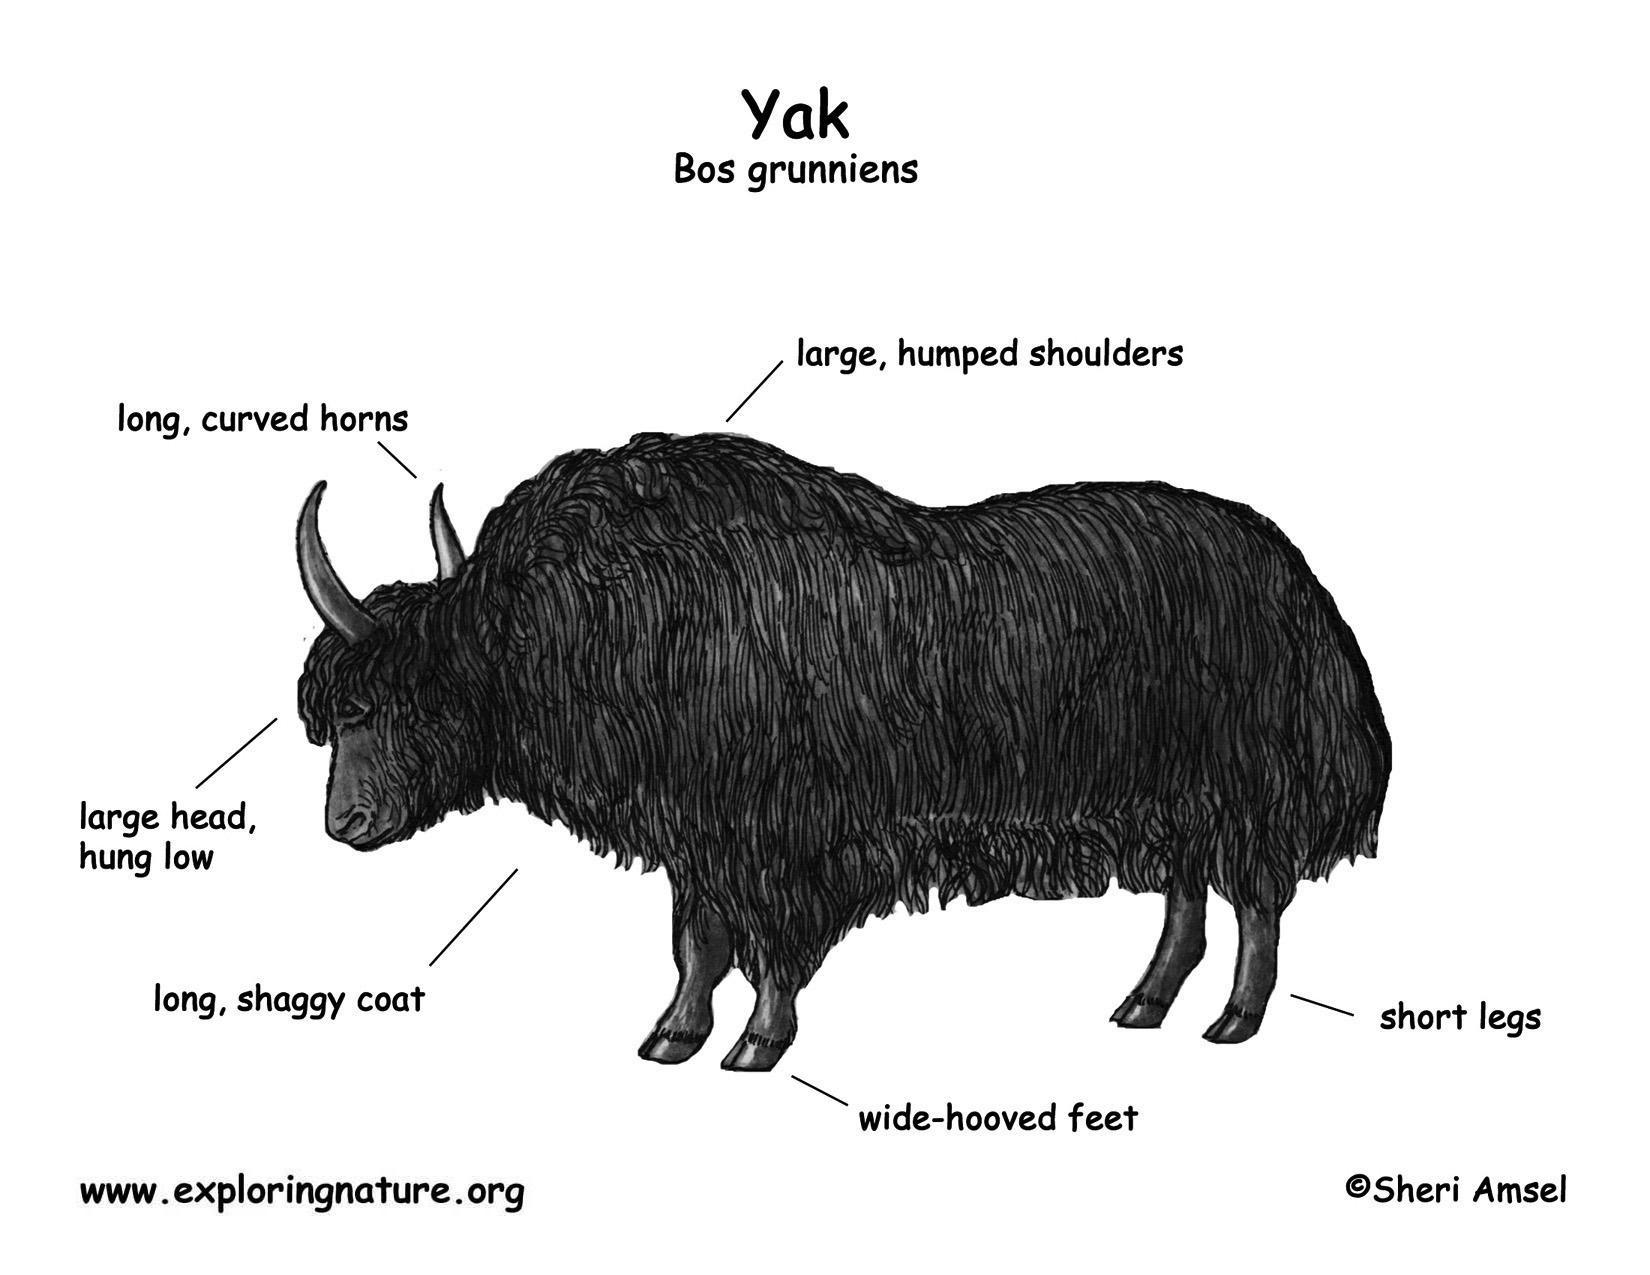 snow leopard anatomy diagram 98 ford contour wiring yak